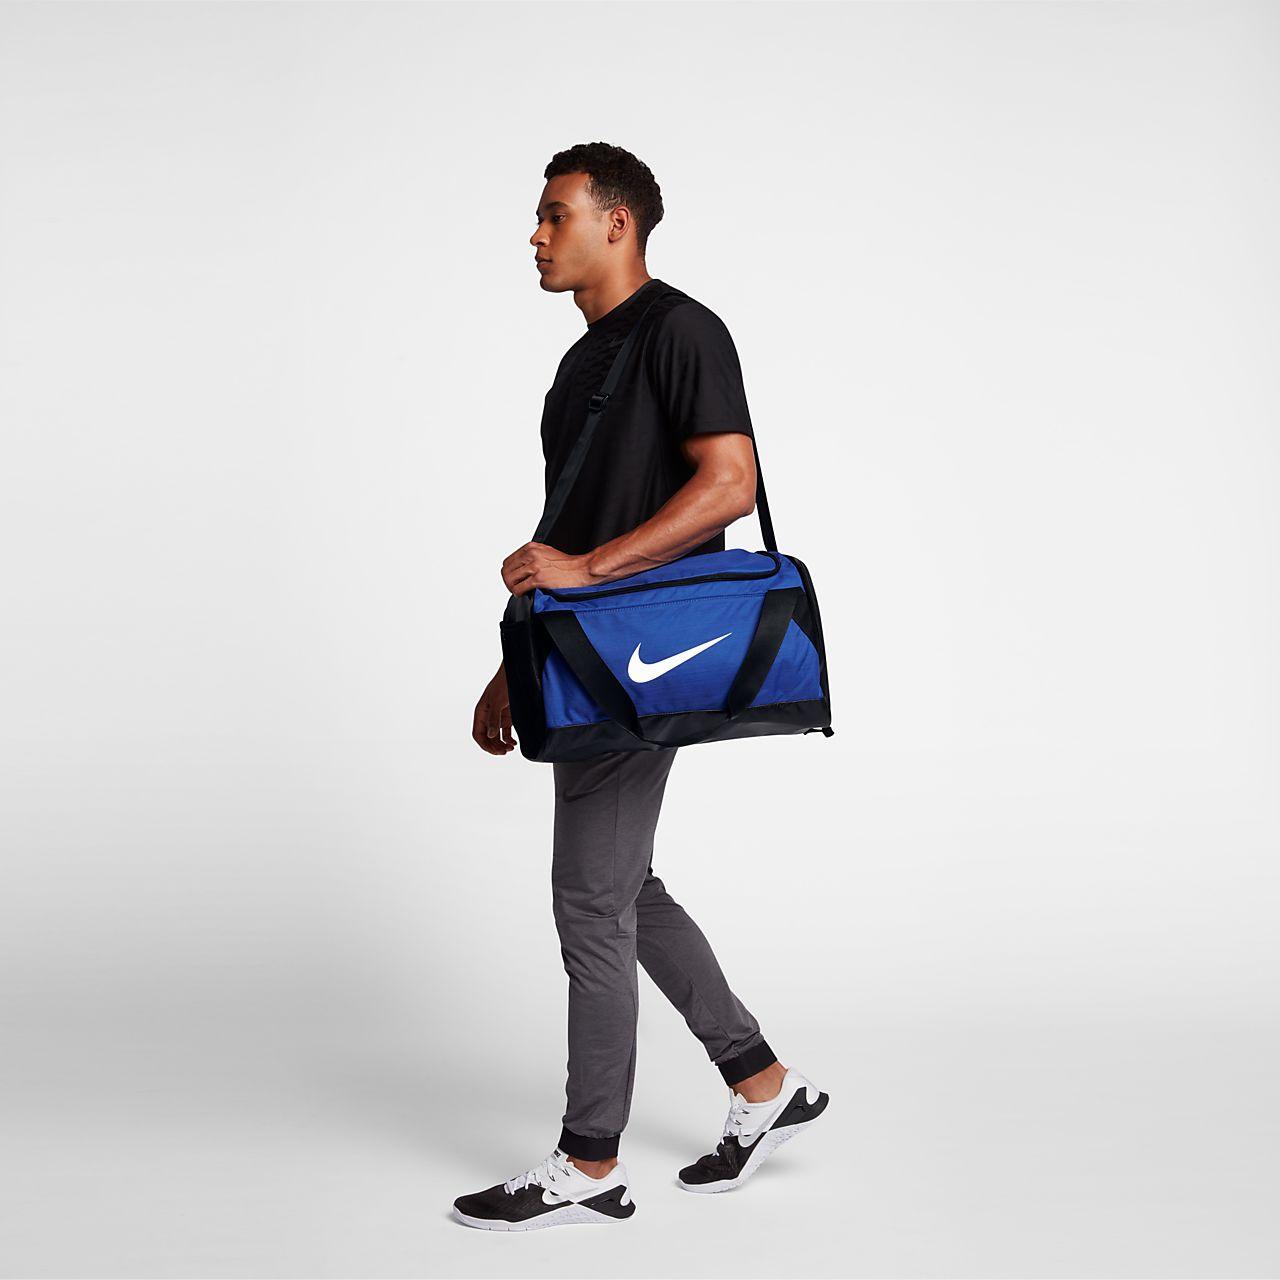 c71567da5d Τσάντα γυμναστηρίου Nike Brasilia (μέγεθος Small). Nike.com GR